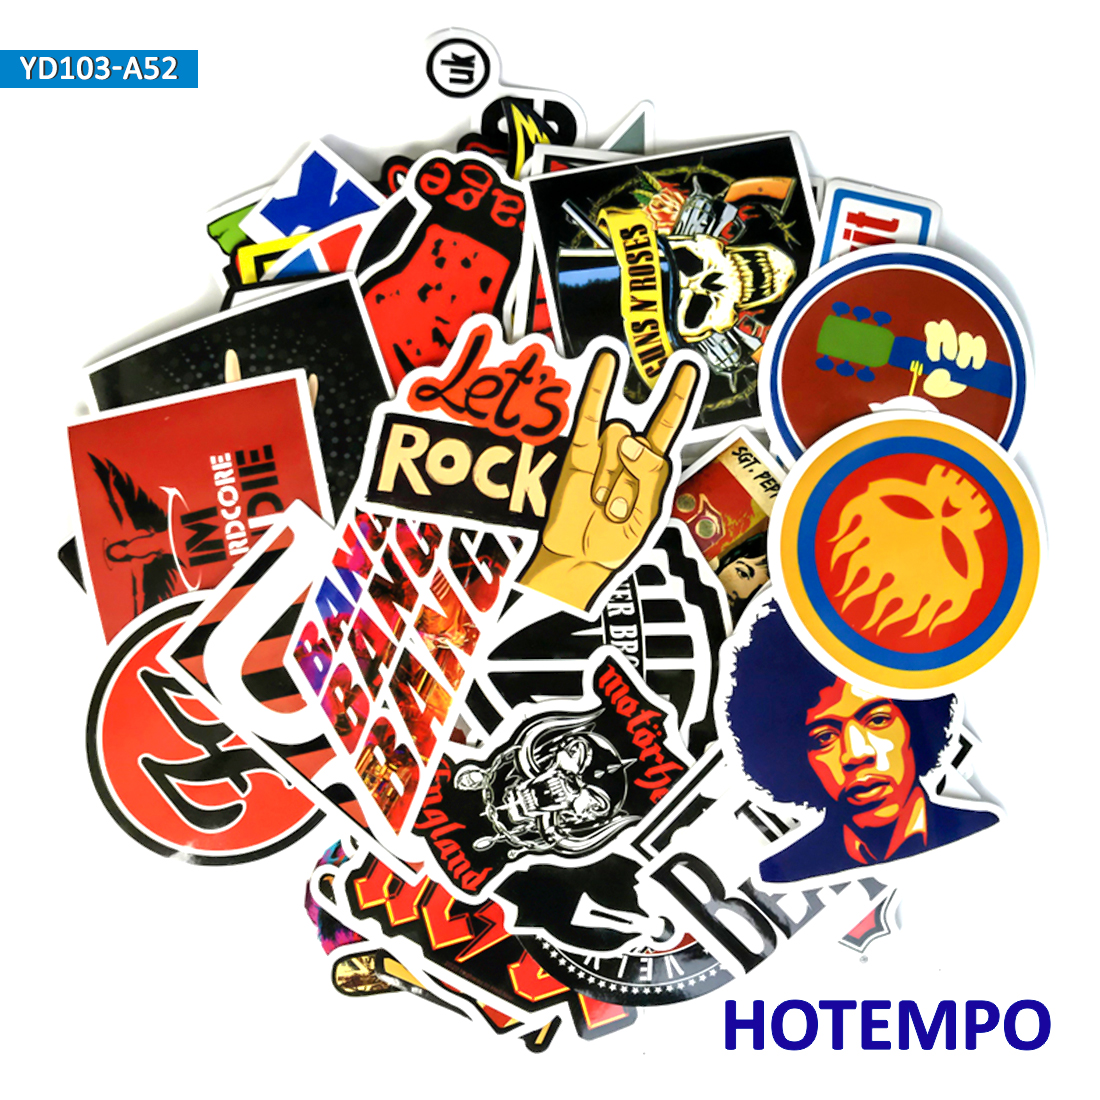 Piezas 60 50 piezas Hip Hop Rock Roll Punk música Banda estilo pegatinas para  teléfono móvil portátil equipaje guitarra Skateboard bicicleta coche  pegatinas 7f98b42d986